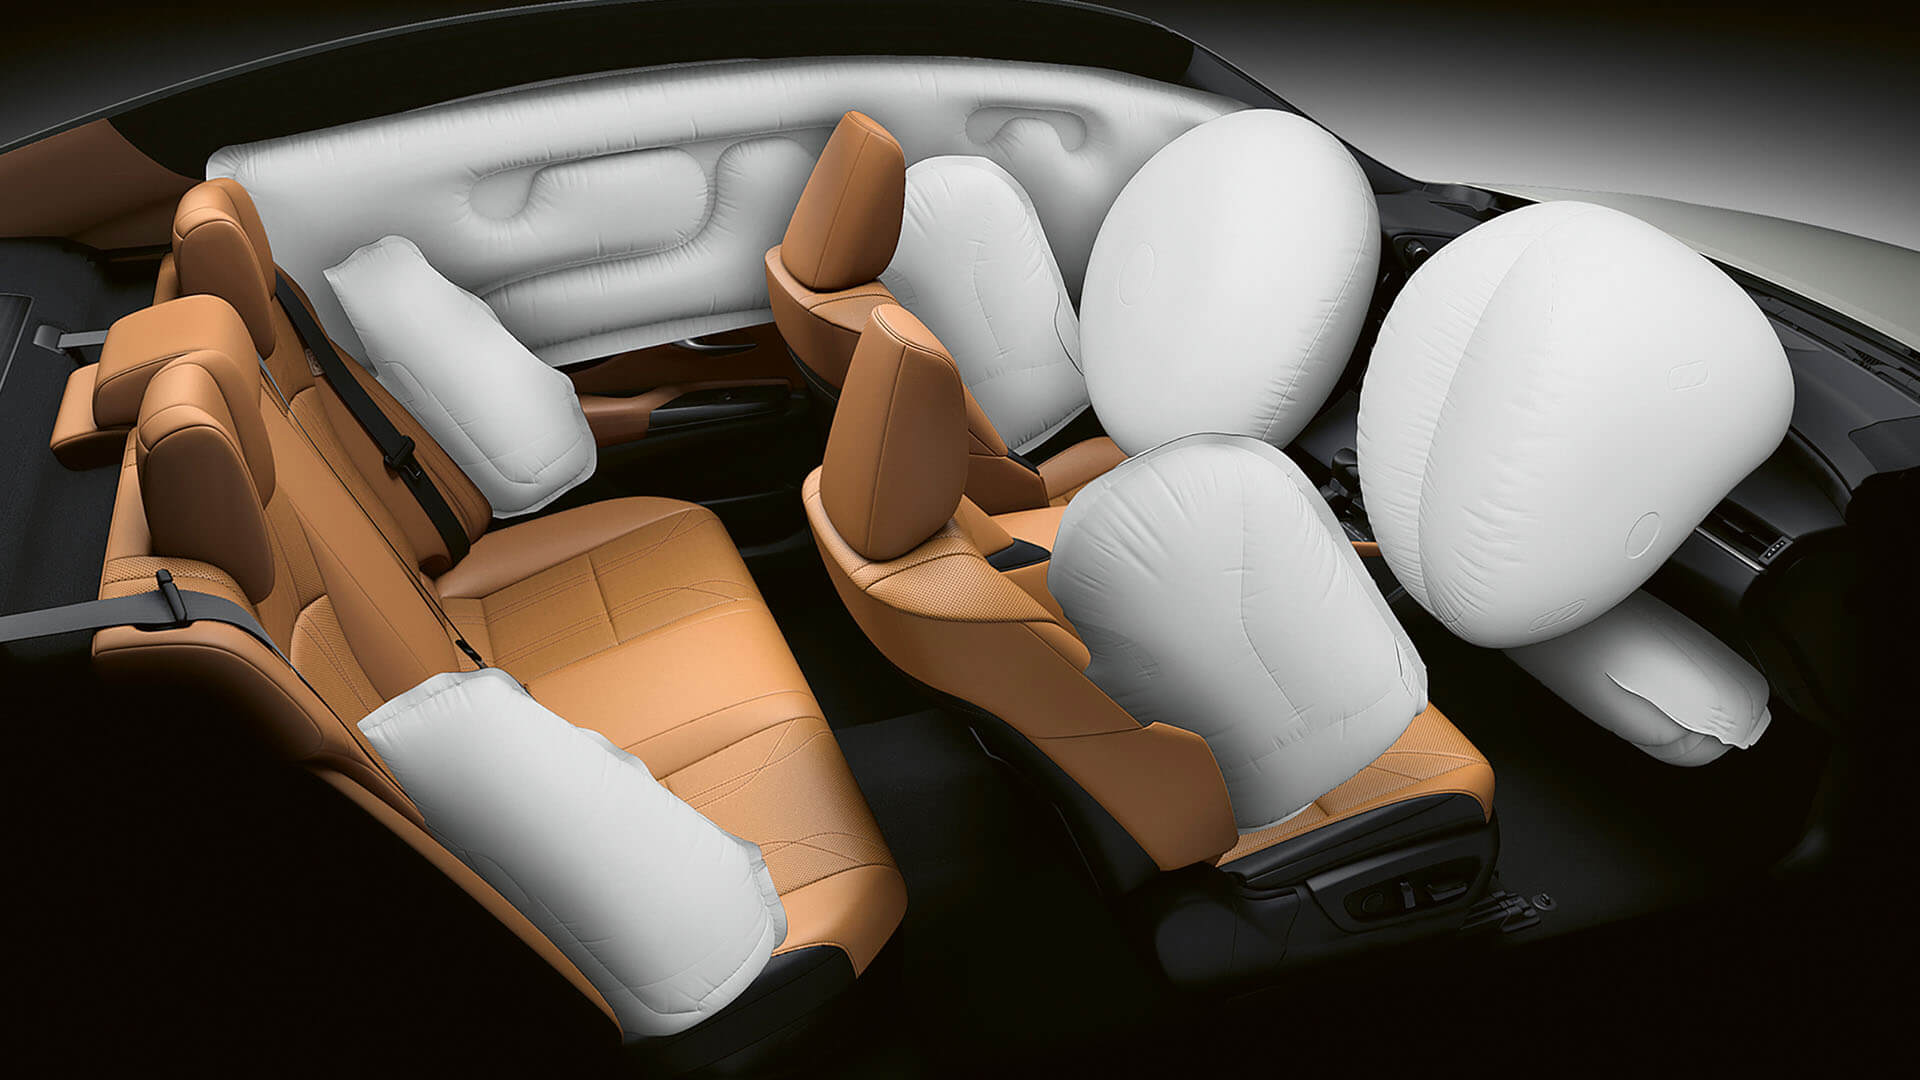 2022 lexus es experience interior back rear airbags